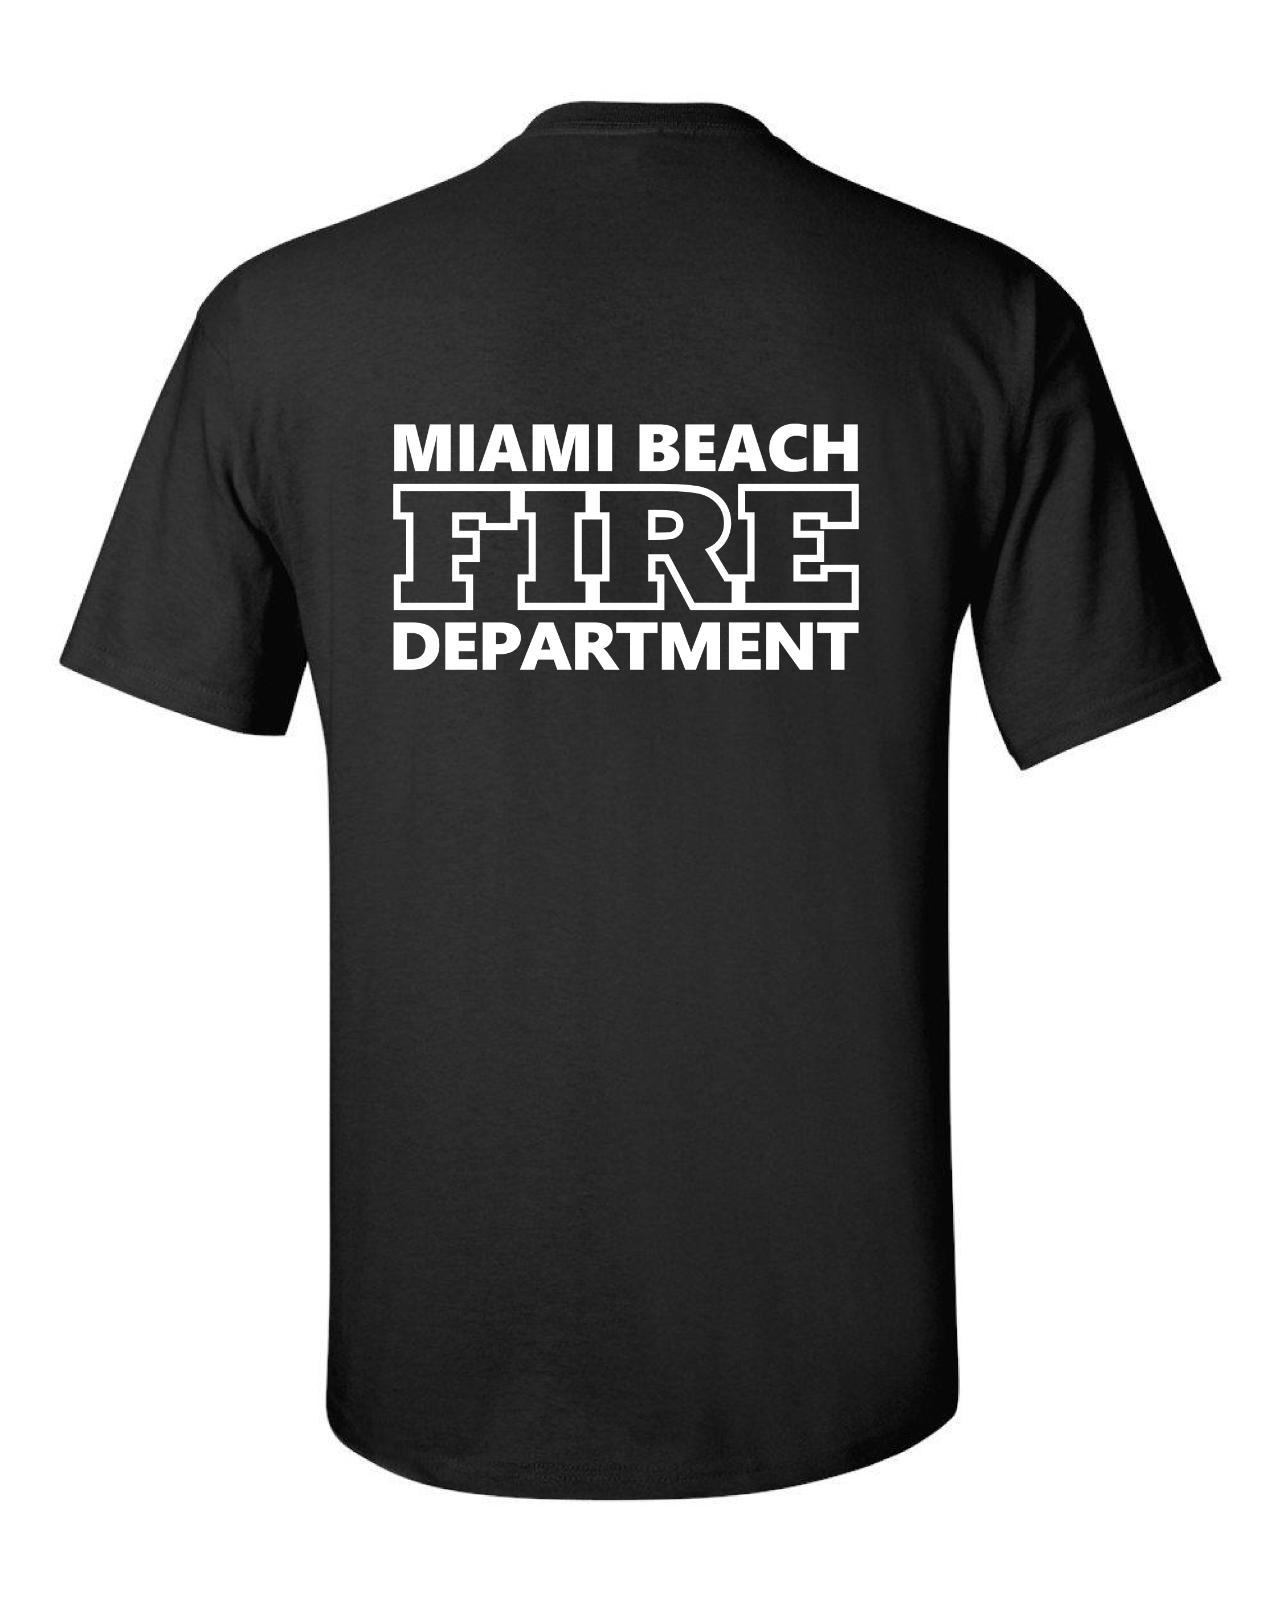 2019 Harajuku Hot Sale Miami Beach Fire Department T-shirt - American Rescue T-shirt feu